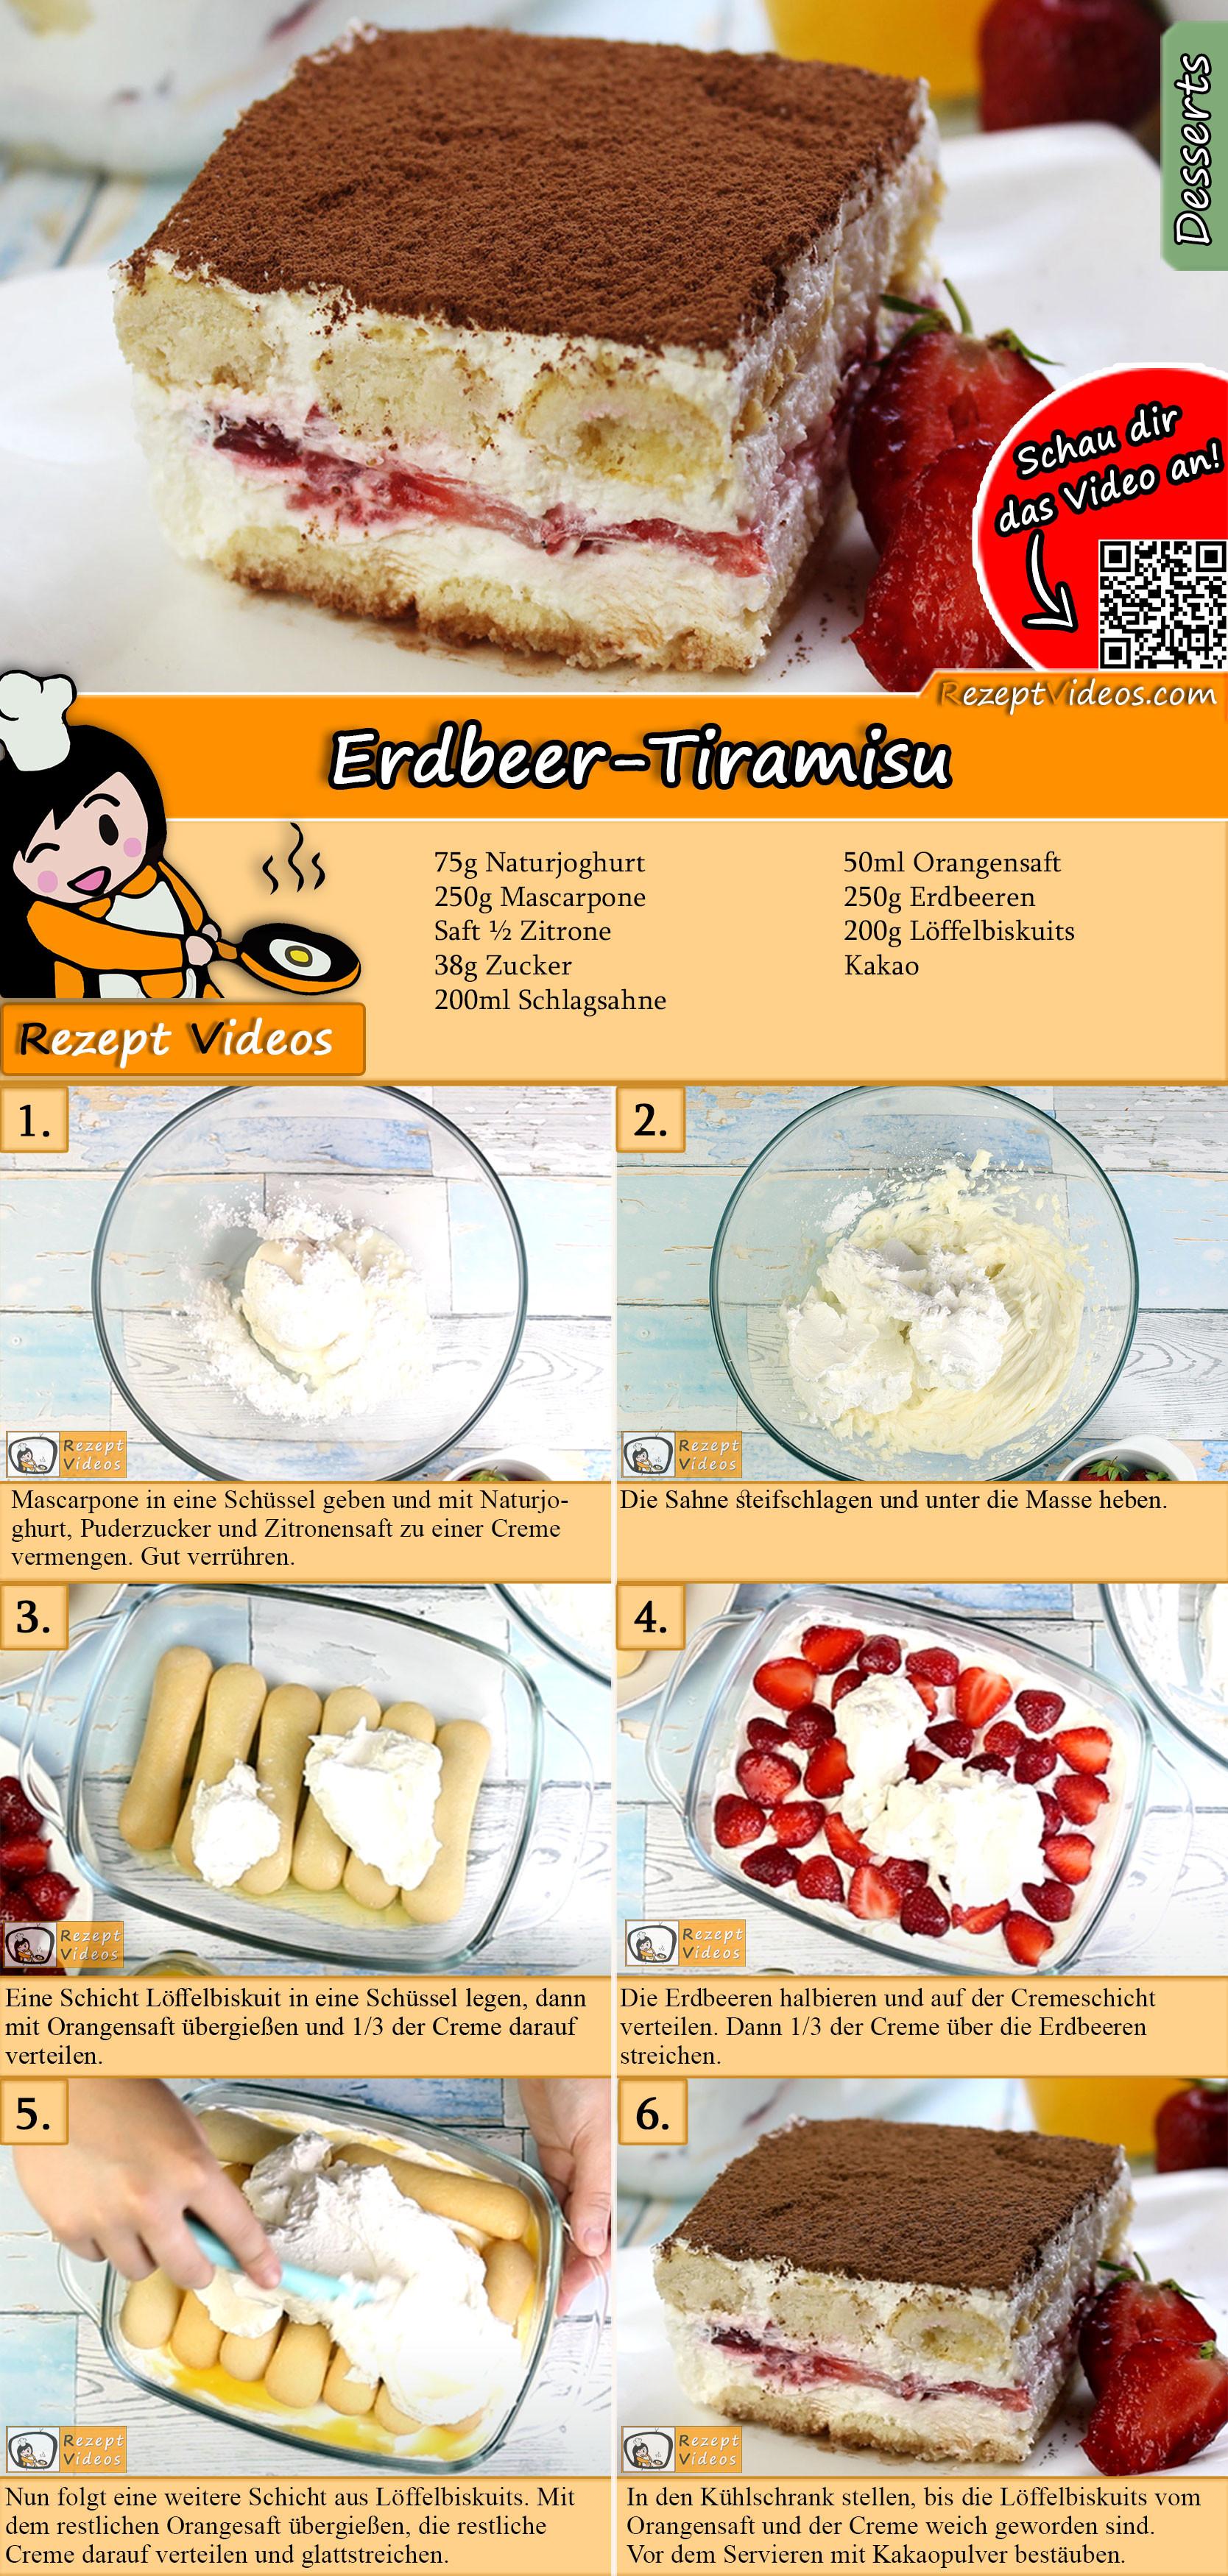 Erdbeer-Tiramisu Rezept mit Video